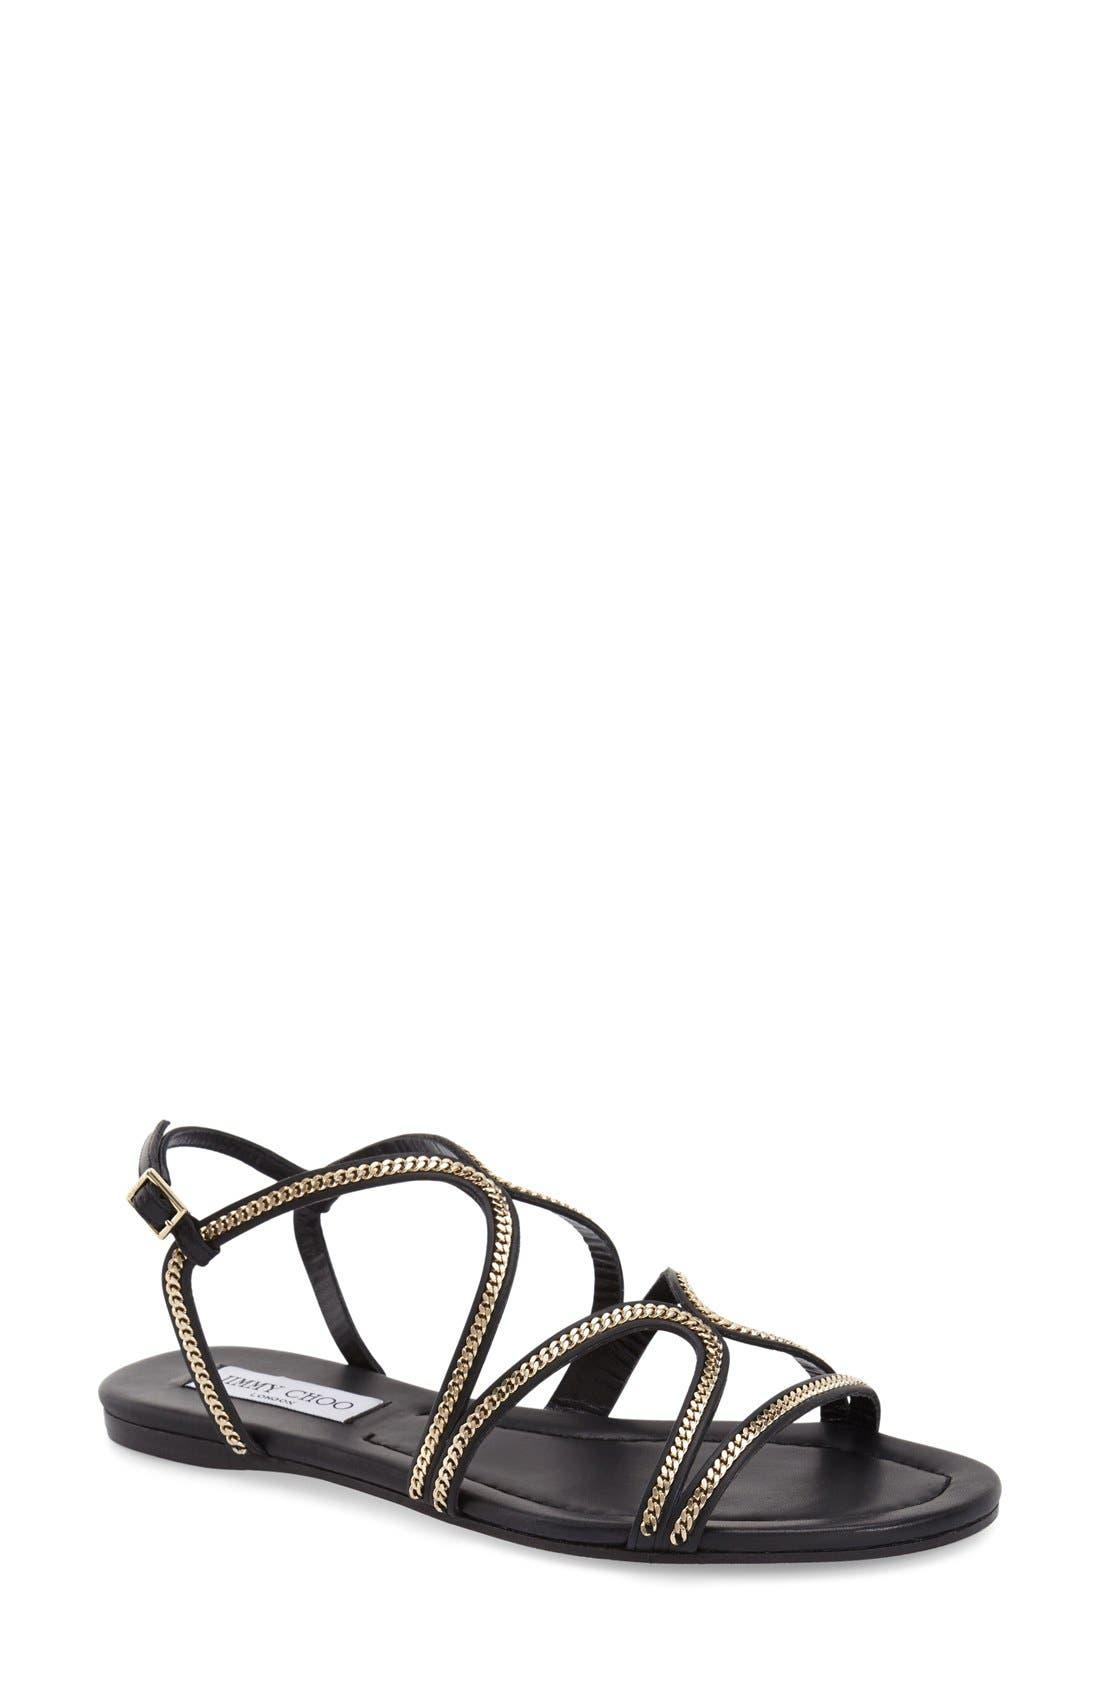 'Nickel' Sandal,                         Main,                         color, Black Leather